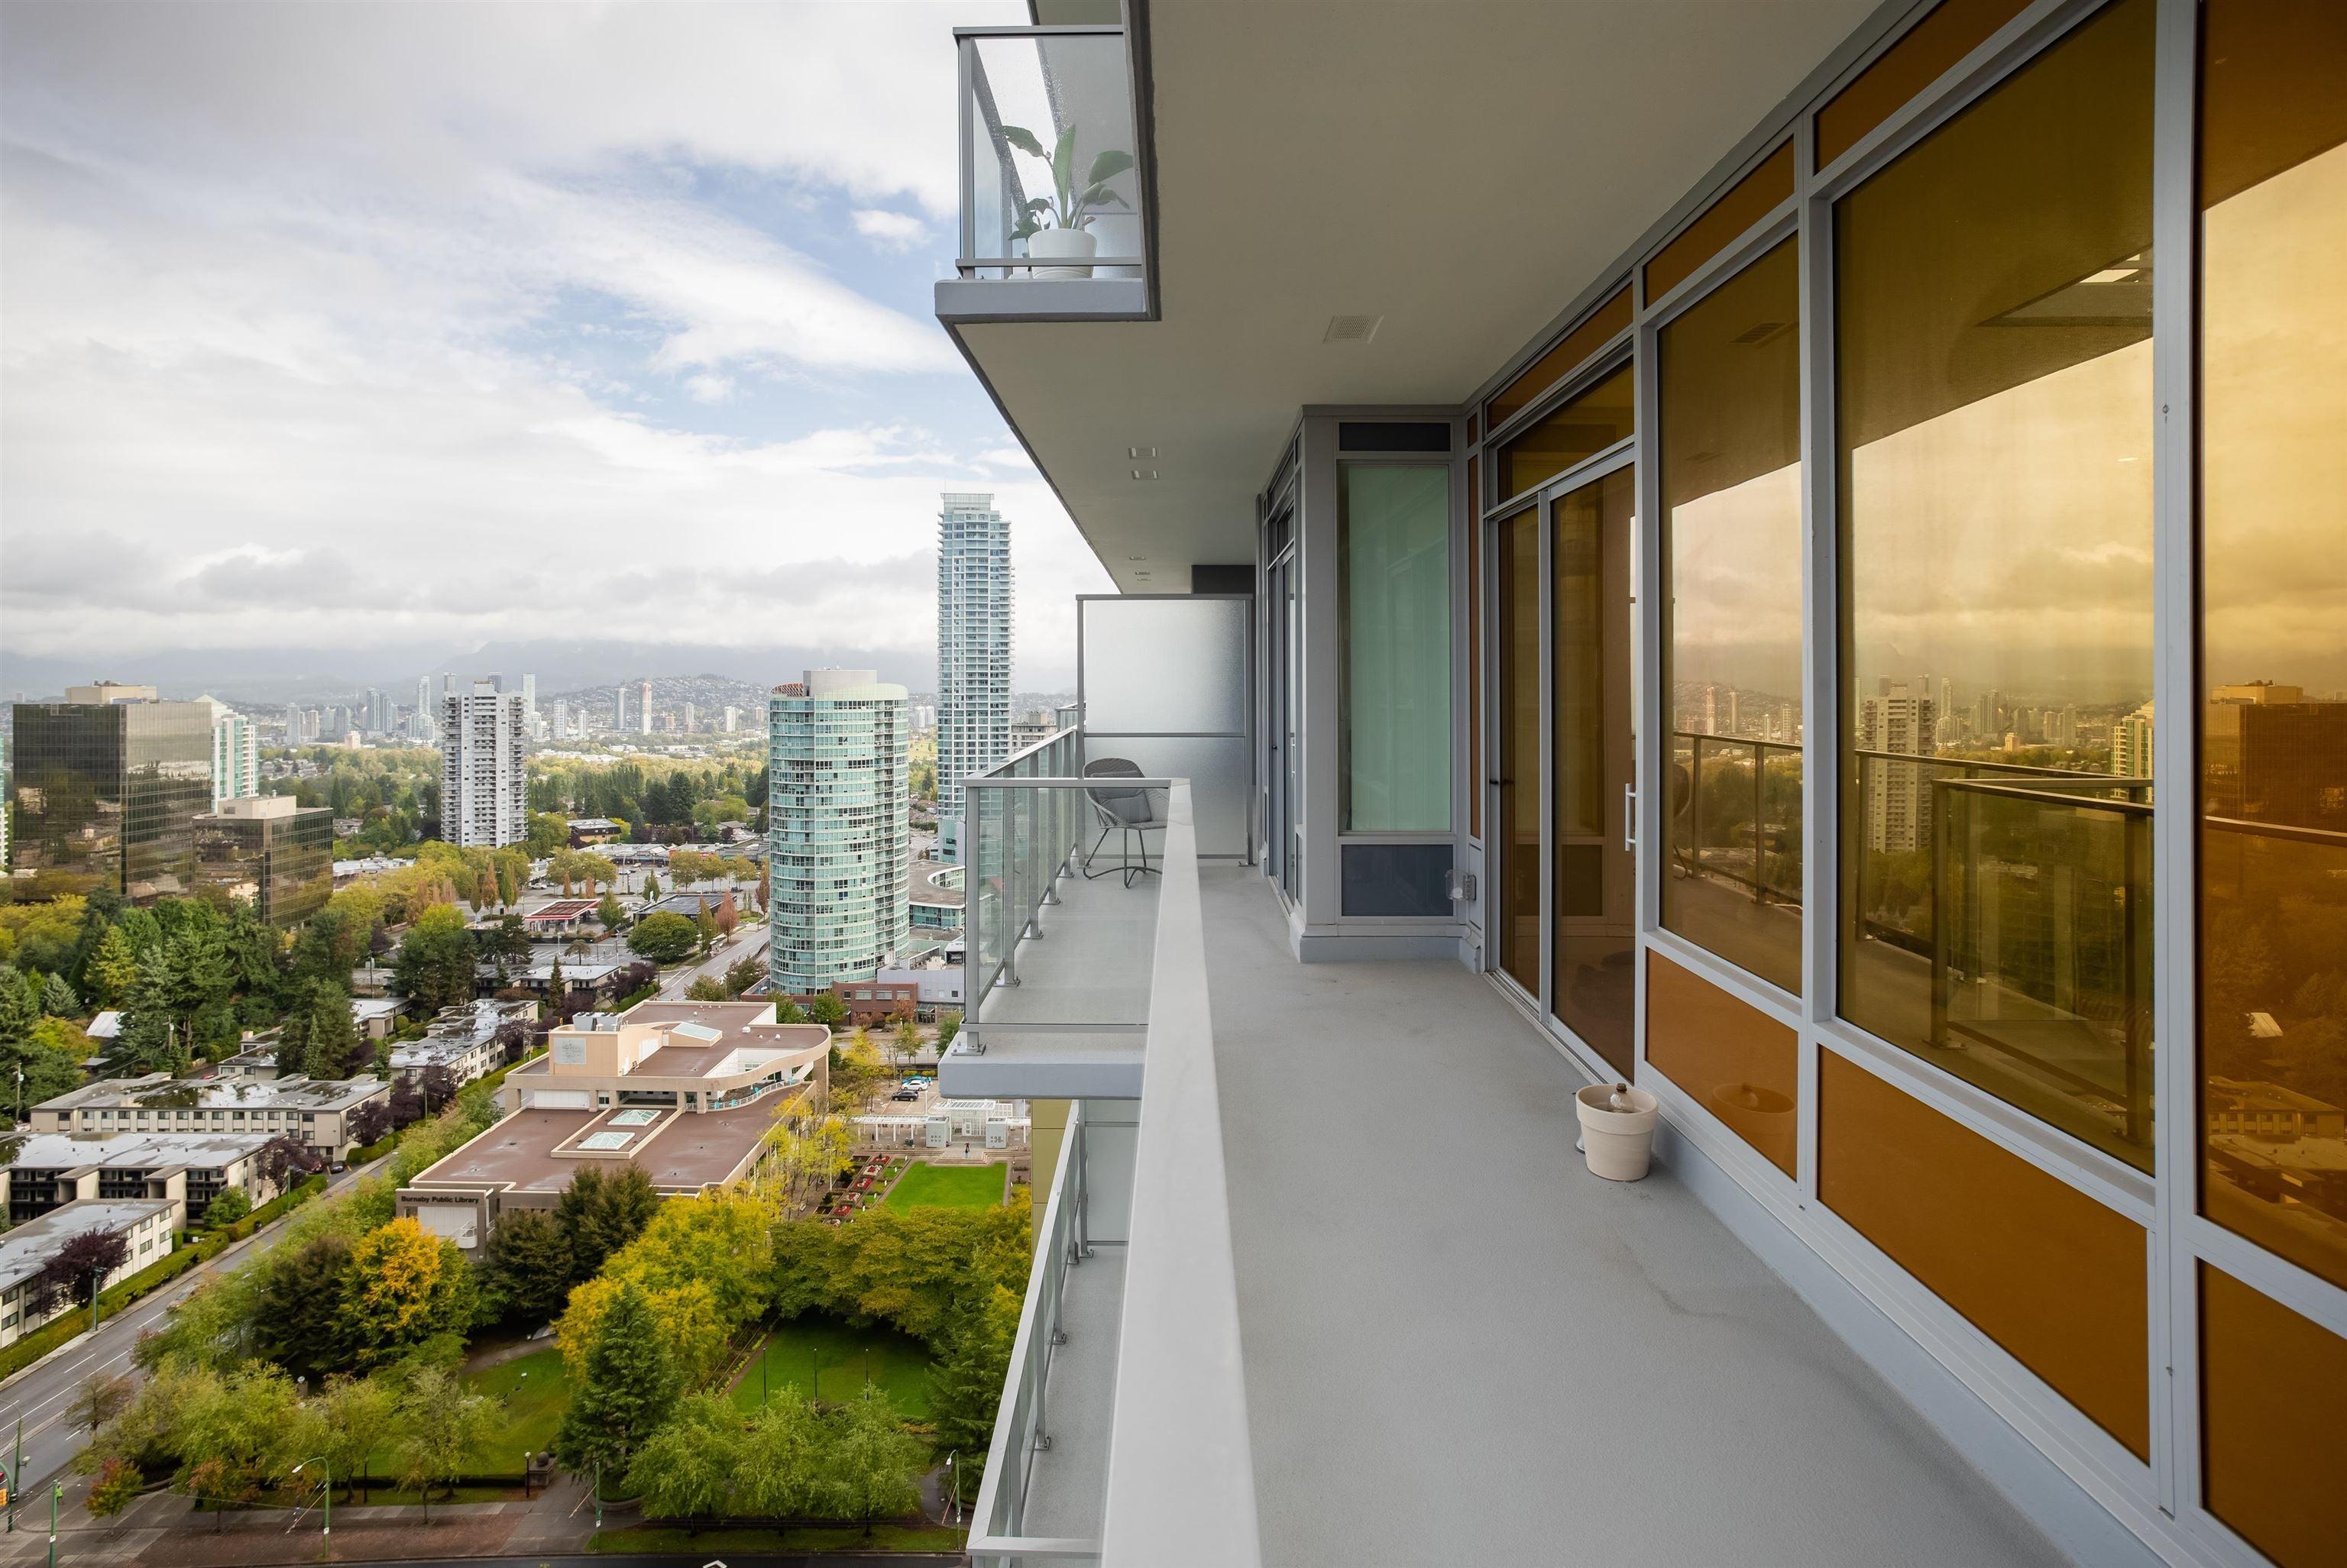 2206 6383 MCKAY AVENUE - Metrotown Apartment/Condo for sale, 2 Bedrooms (R2625647) - #33